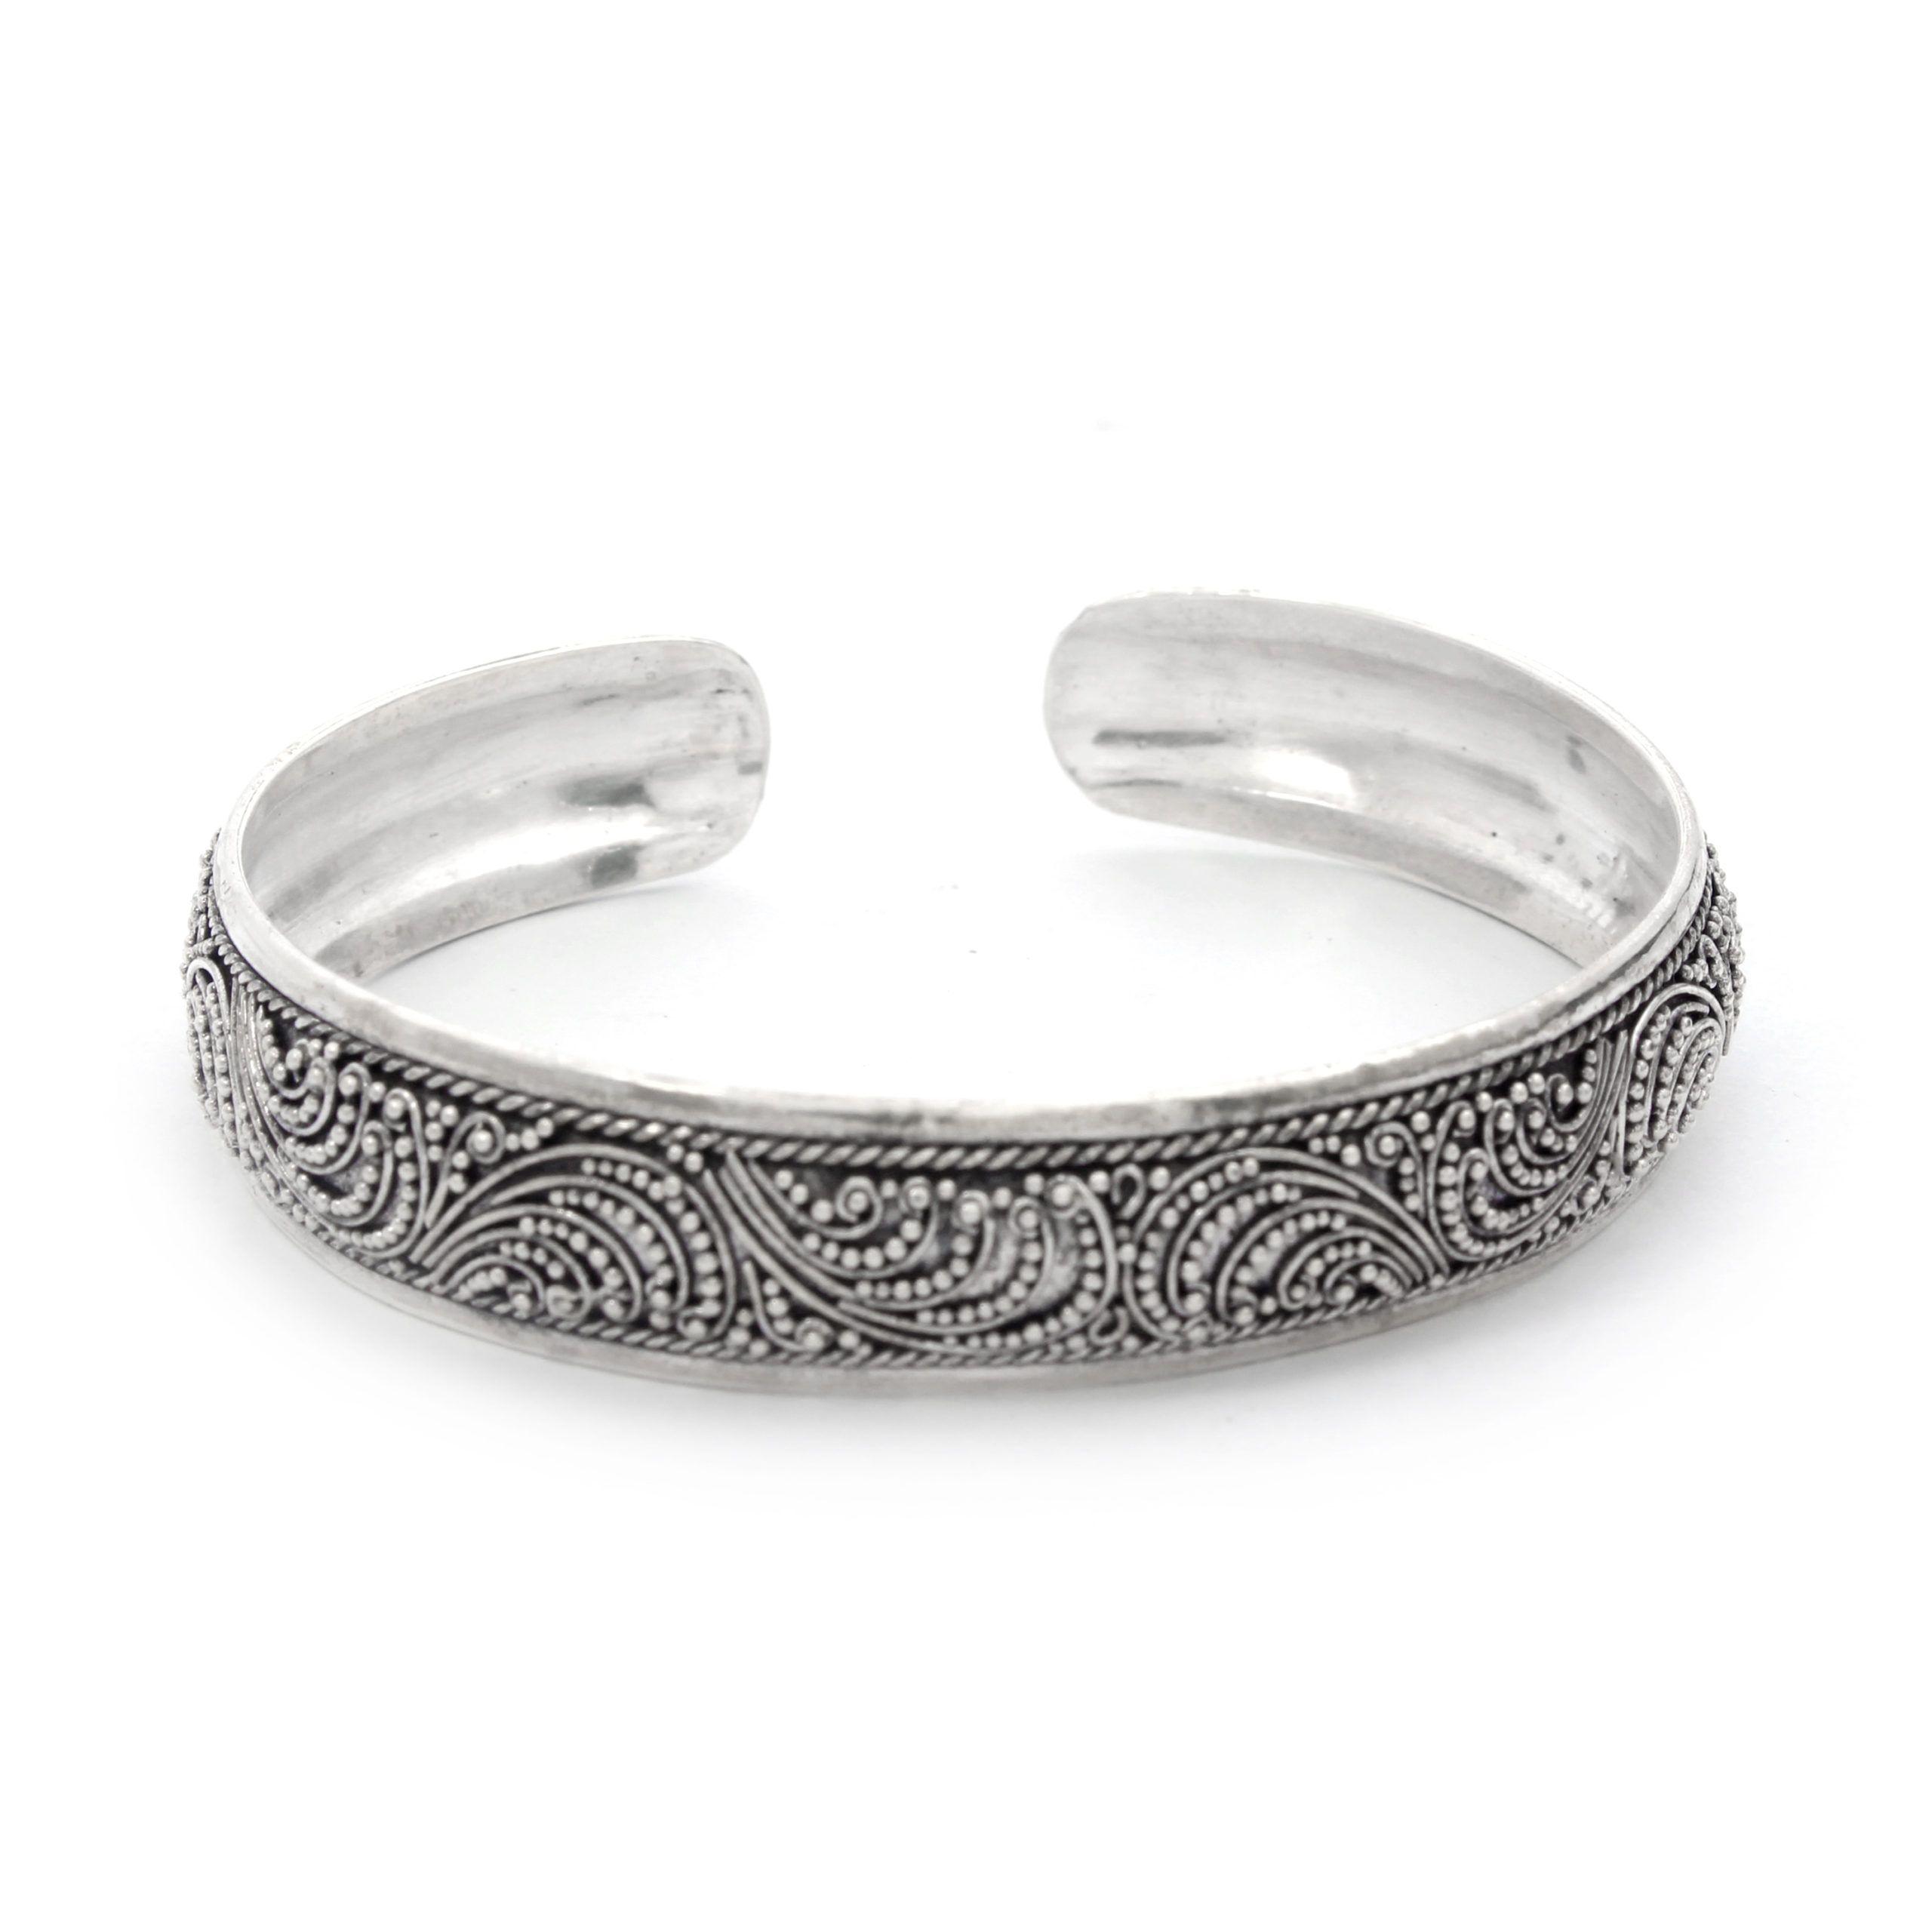 Brazalete plata 925 grabado a mano Shadi